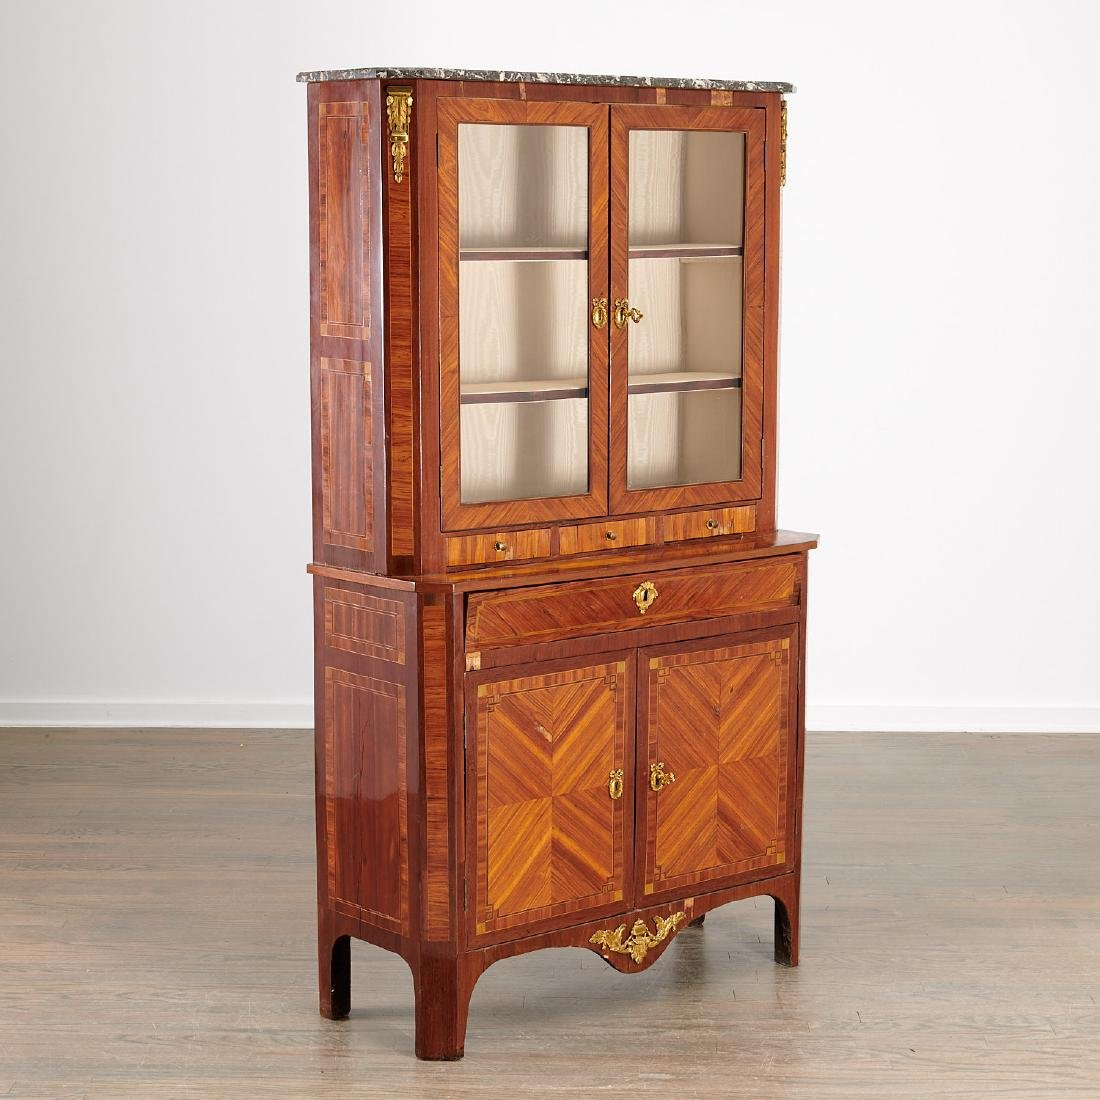 Louis XVI library secretaire bookcase